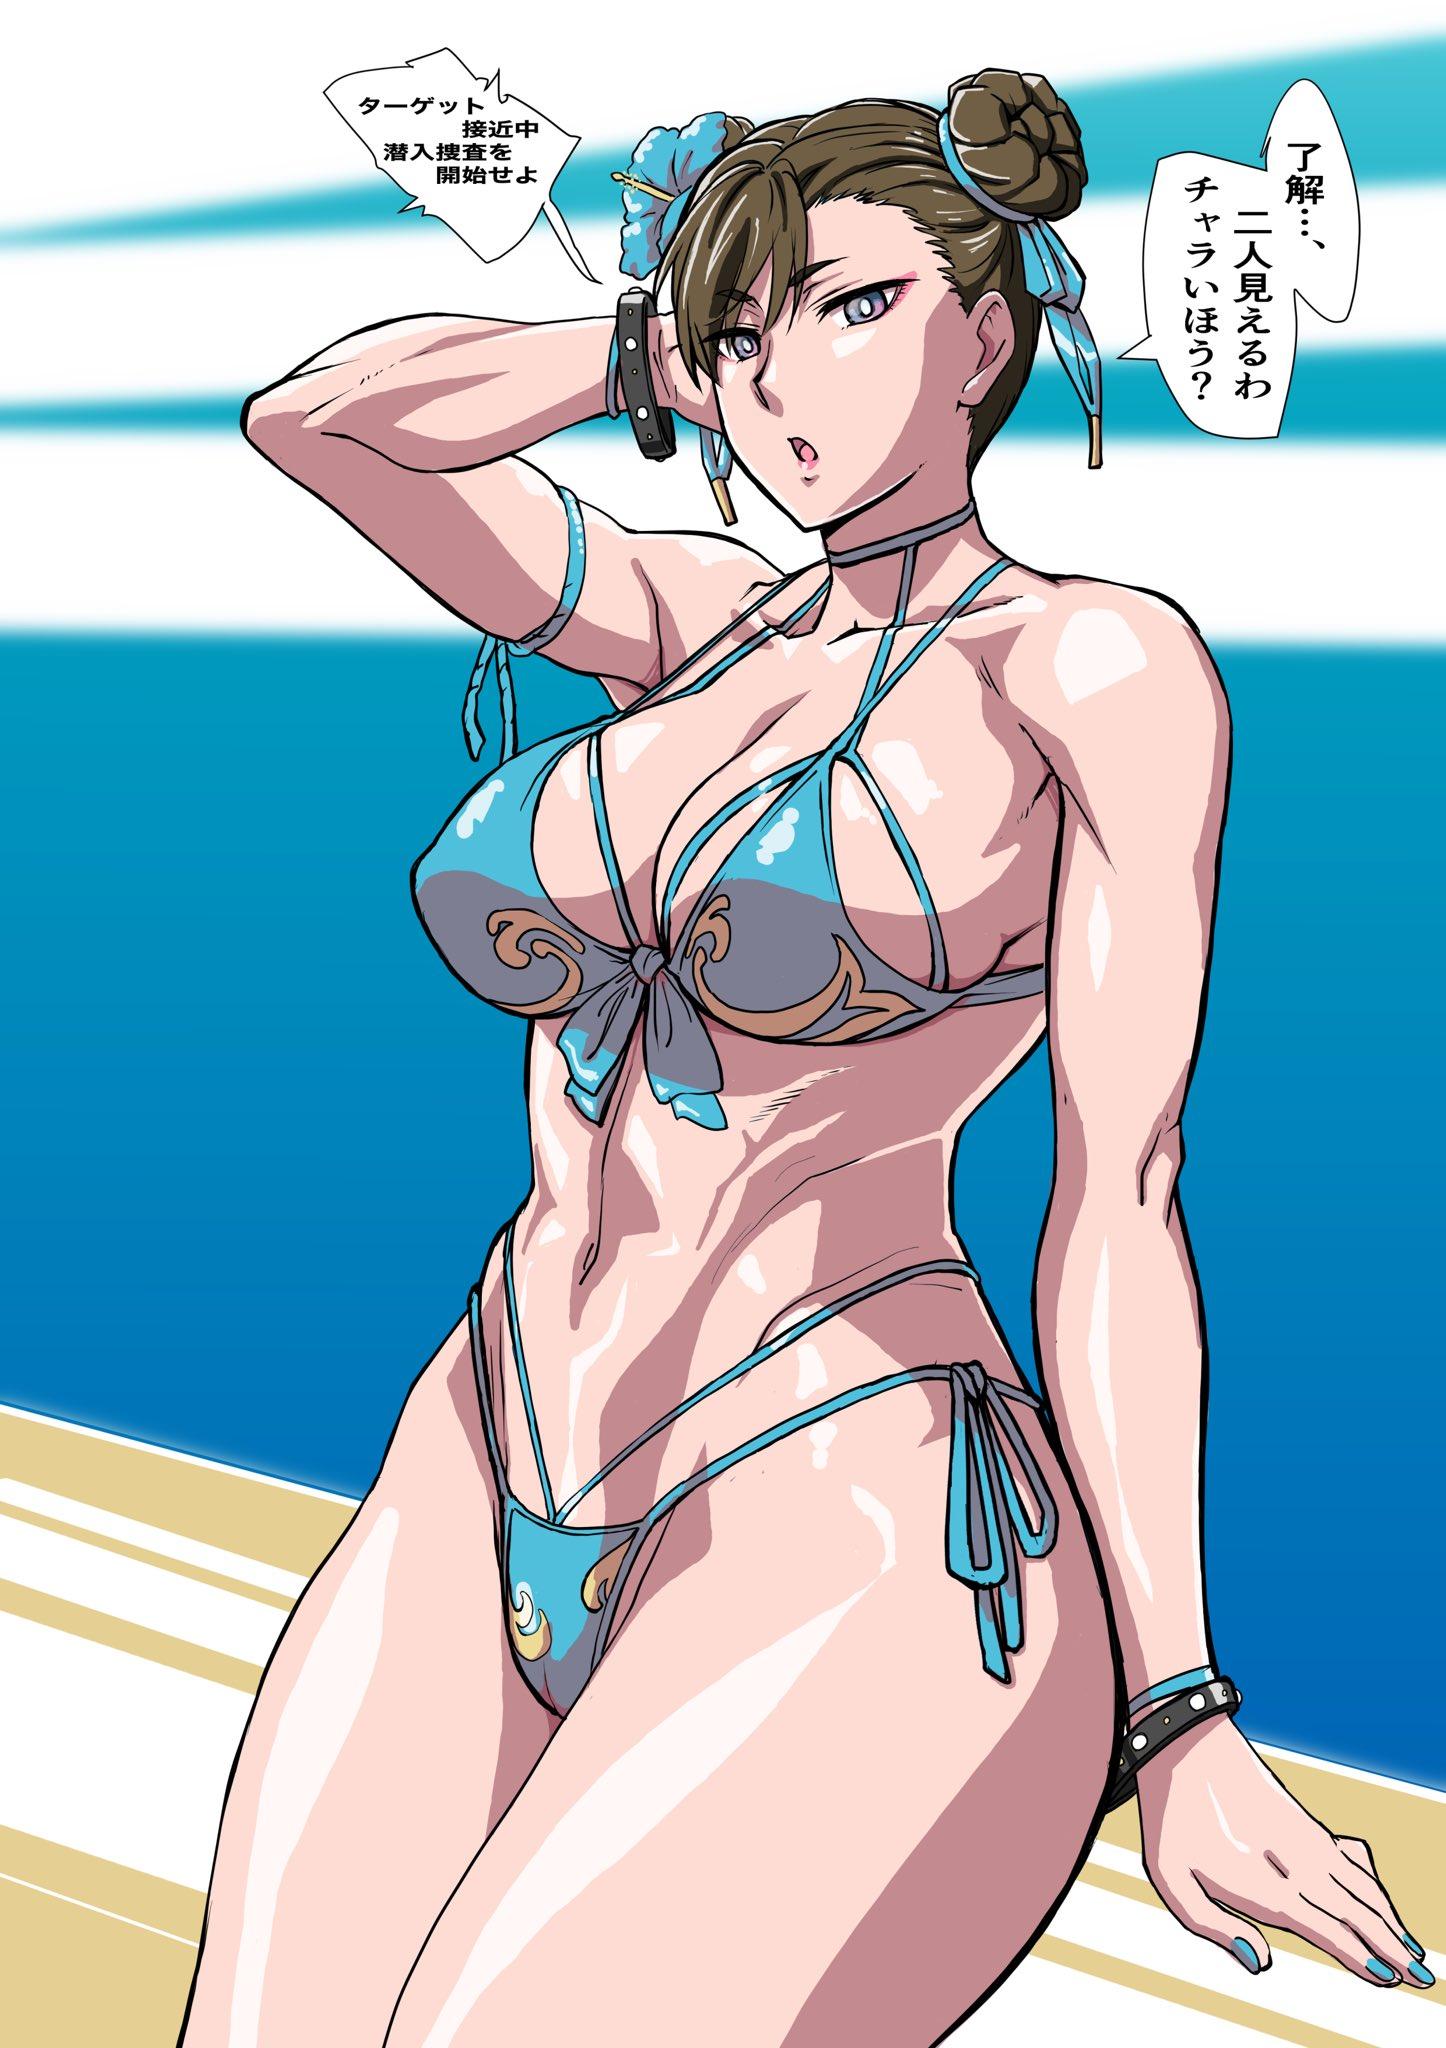 hawaii swimsuit.jpg